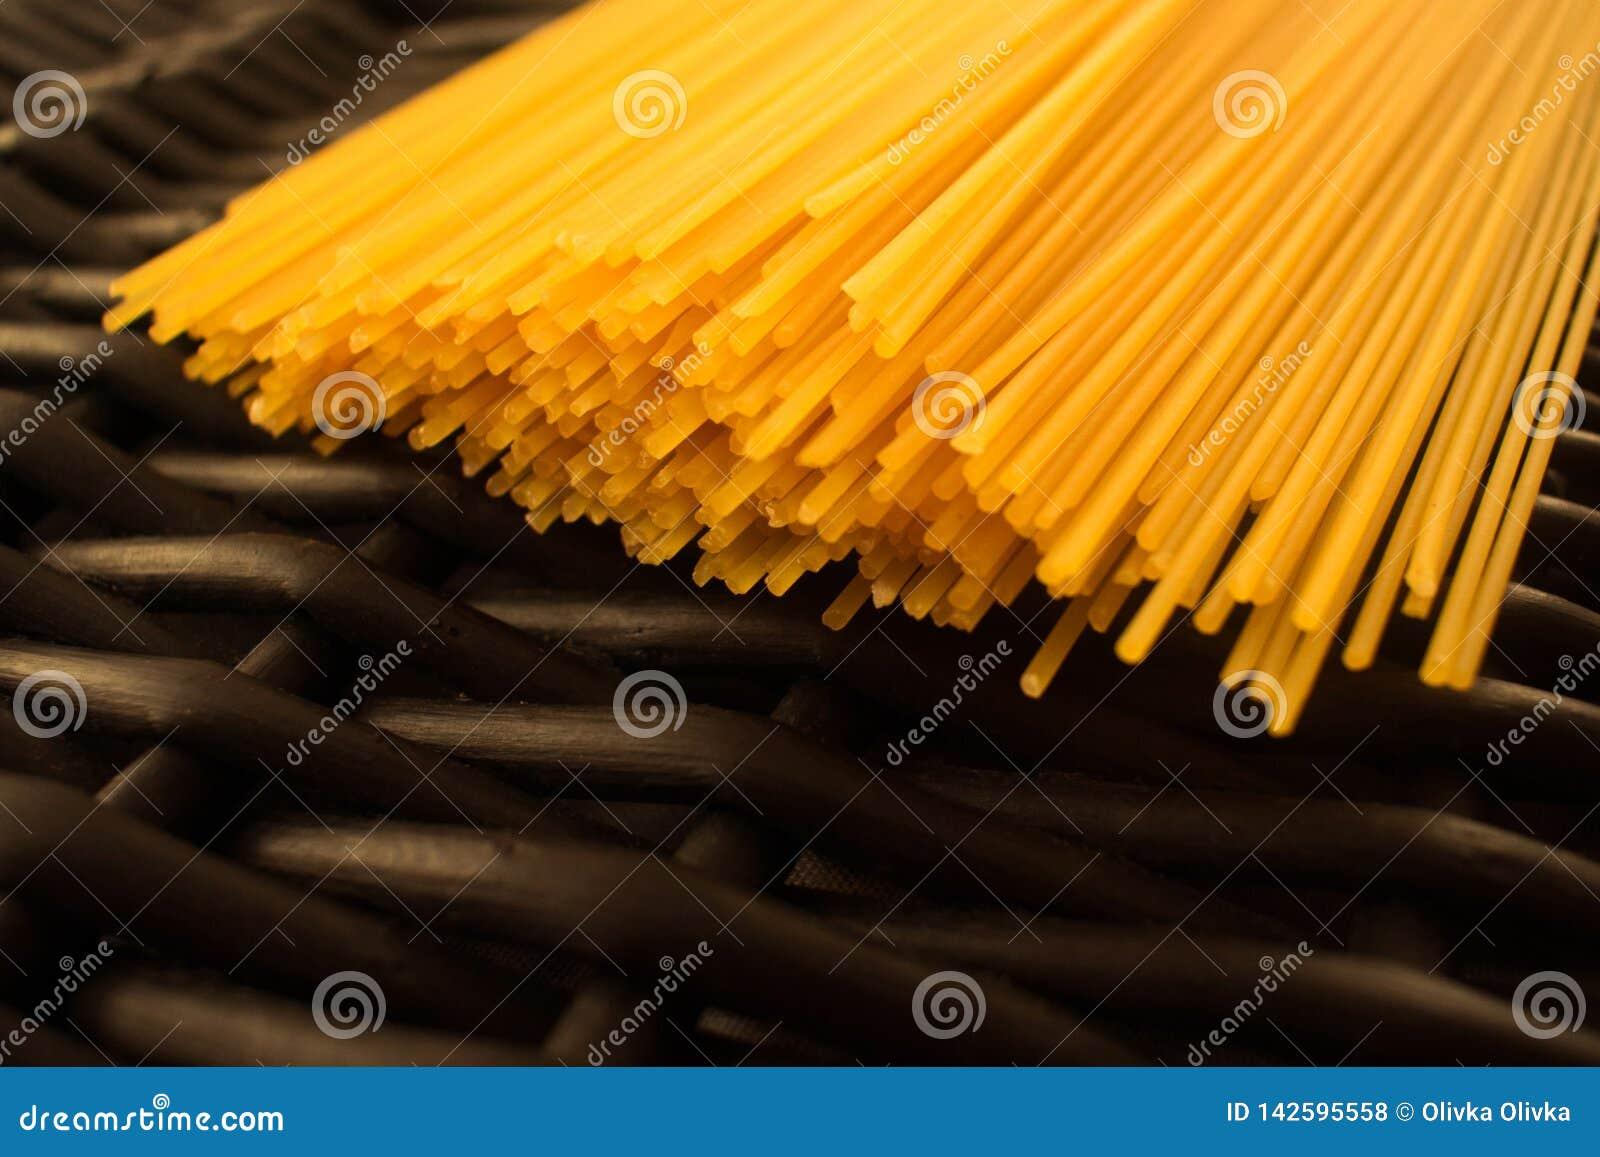 Spaghetti pasta raw black background